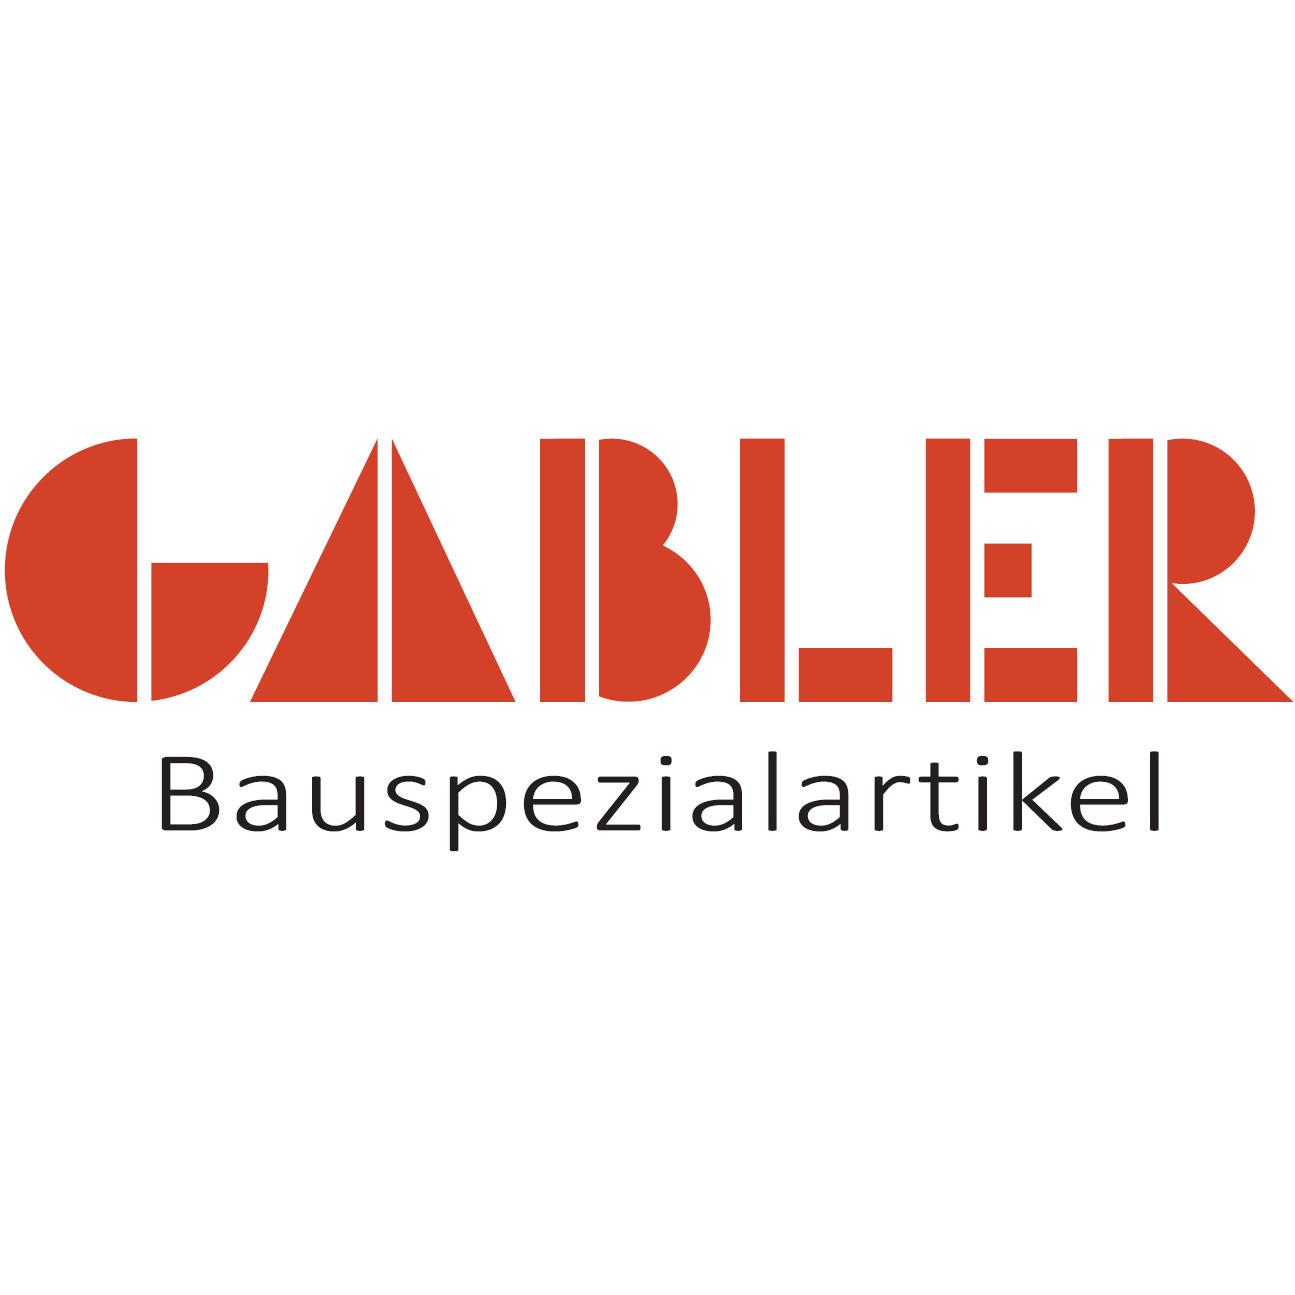 Curt Gabler e.K.